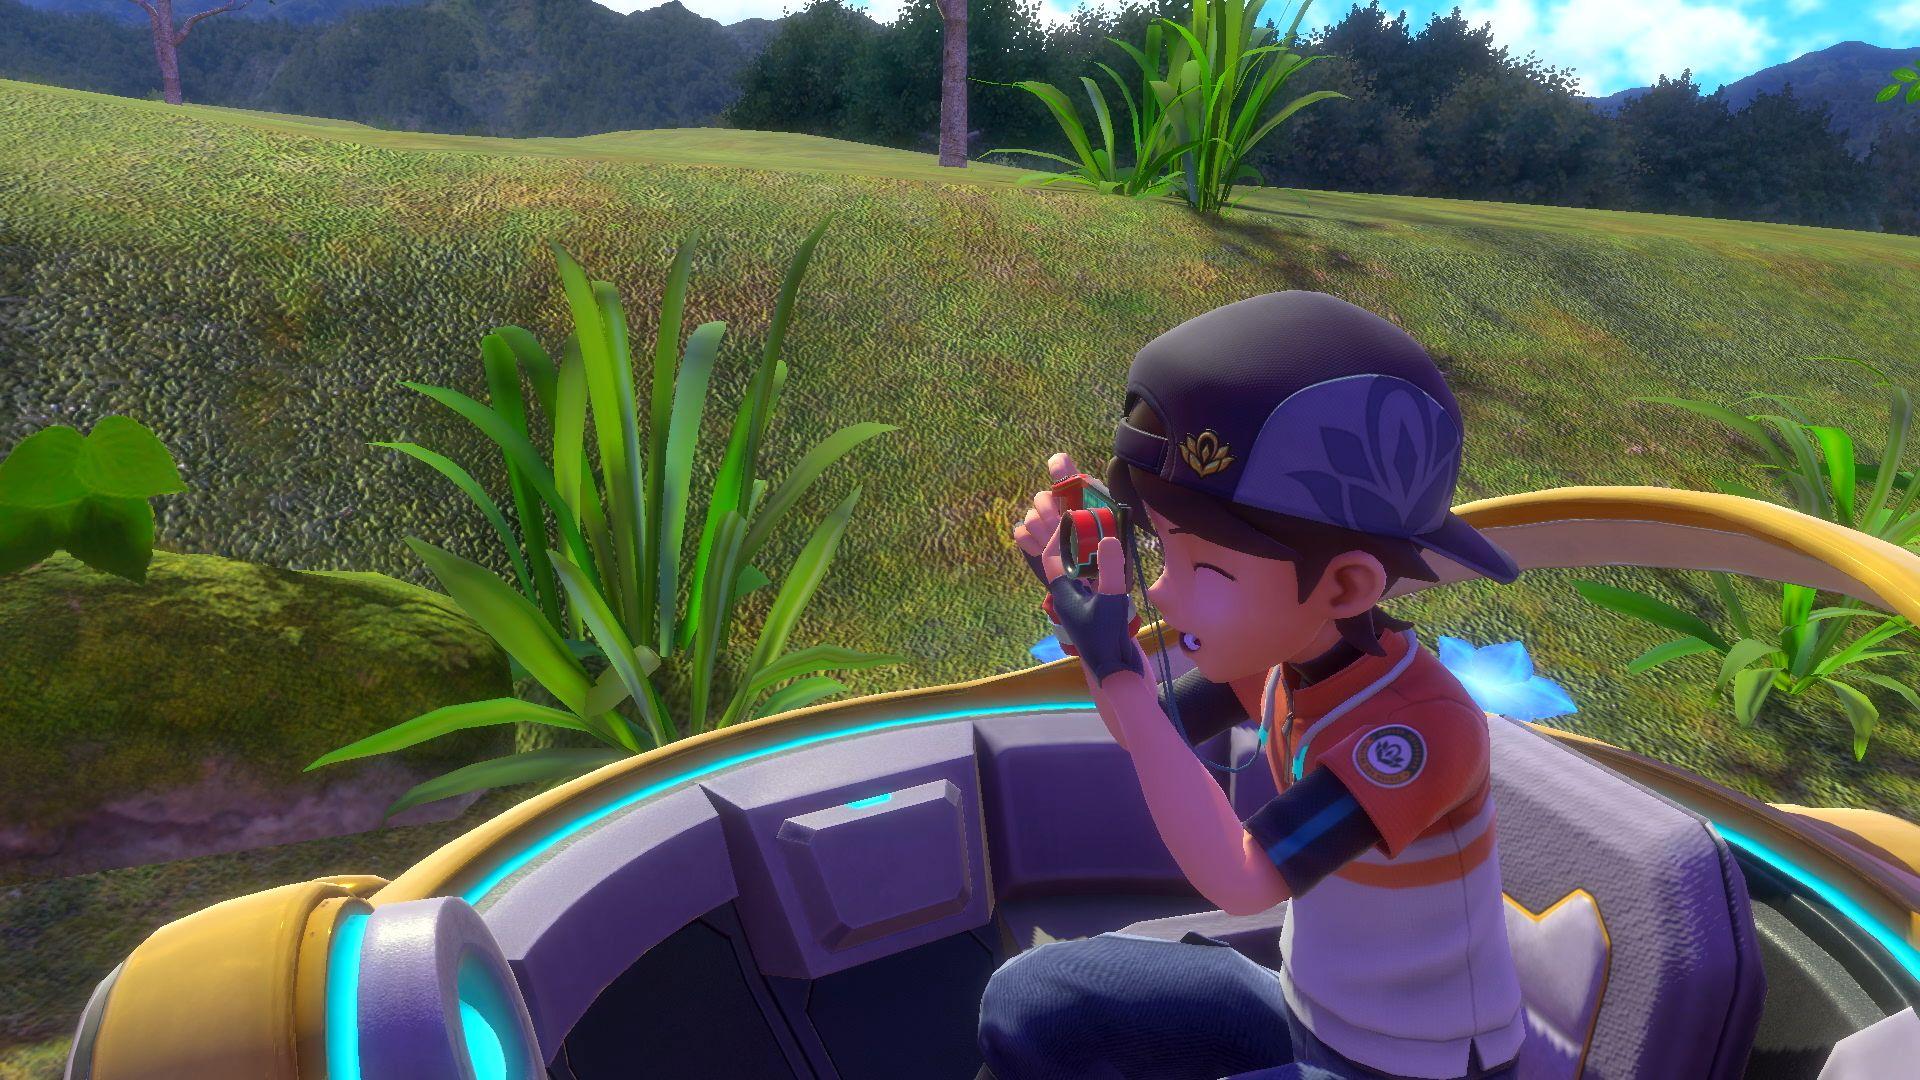 New Pokemon Snap: Five tips for beginner players